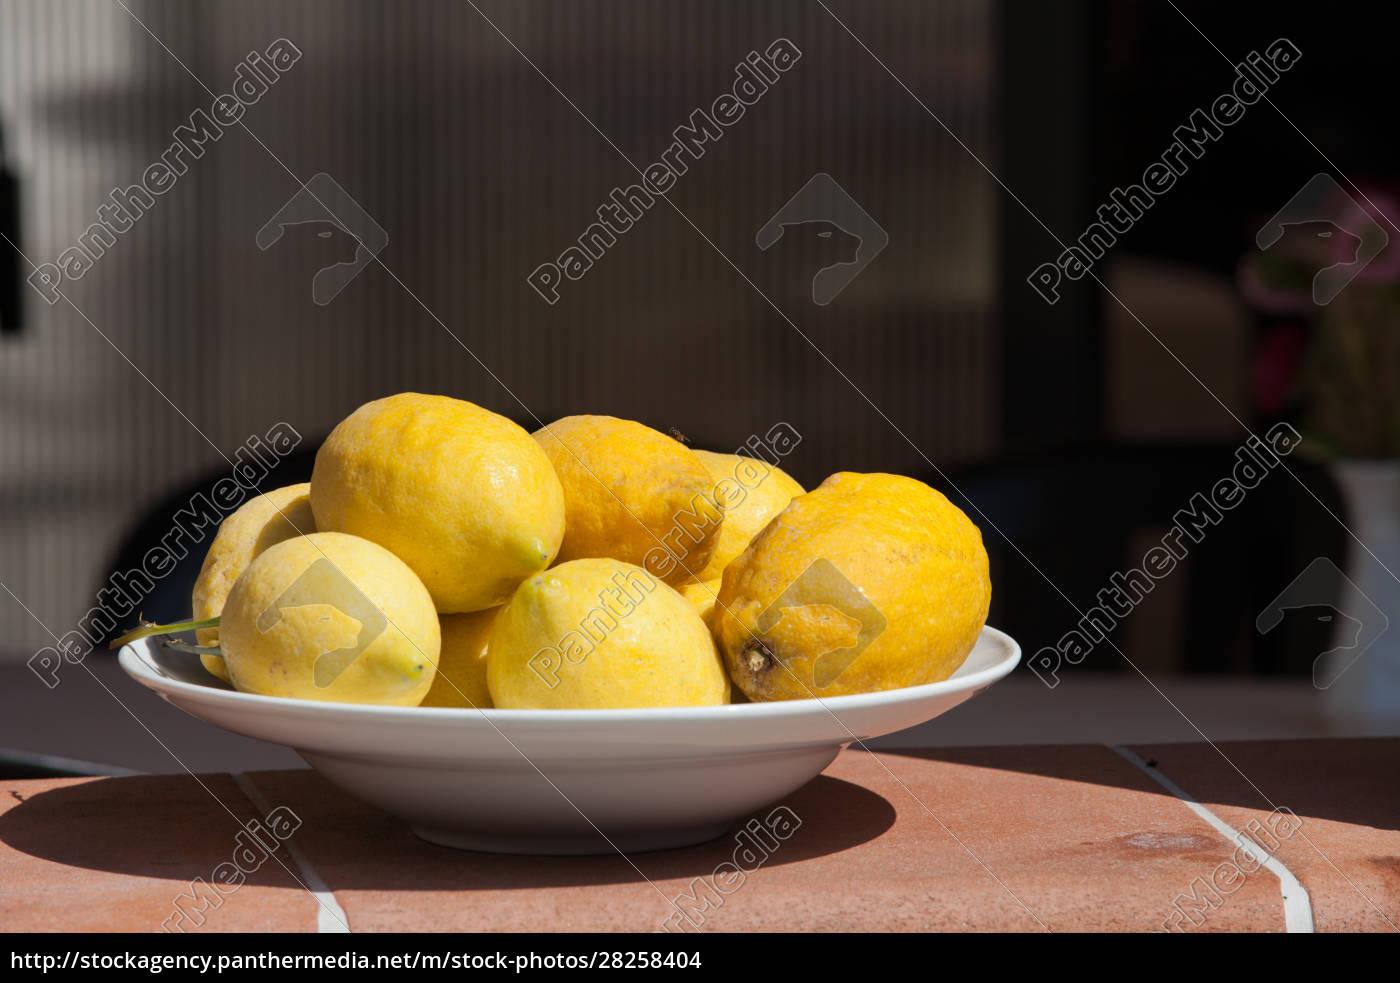 a, plate, of, ripe, lemons - 28258404